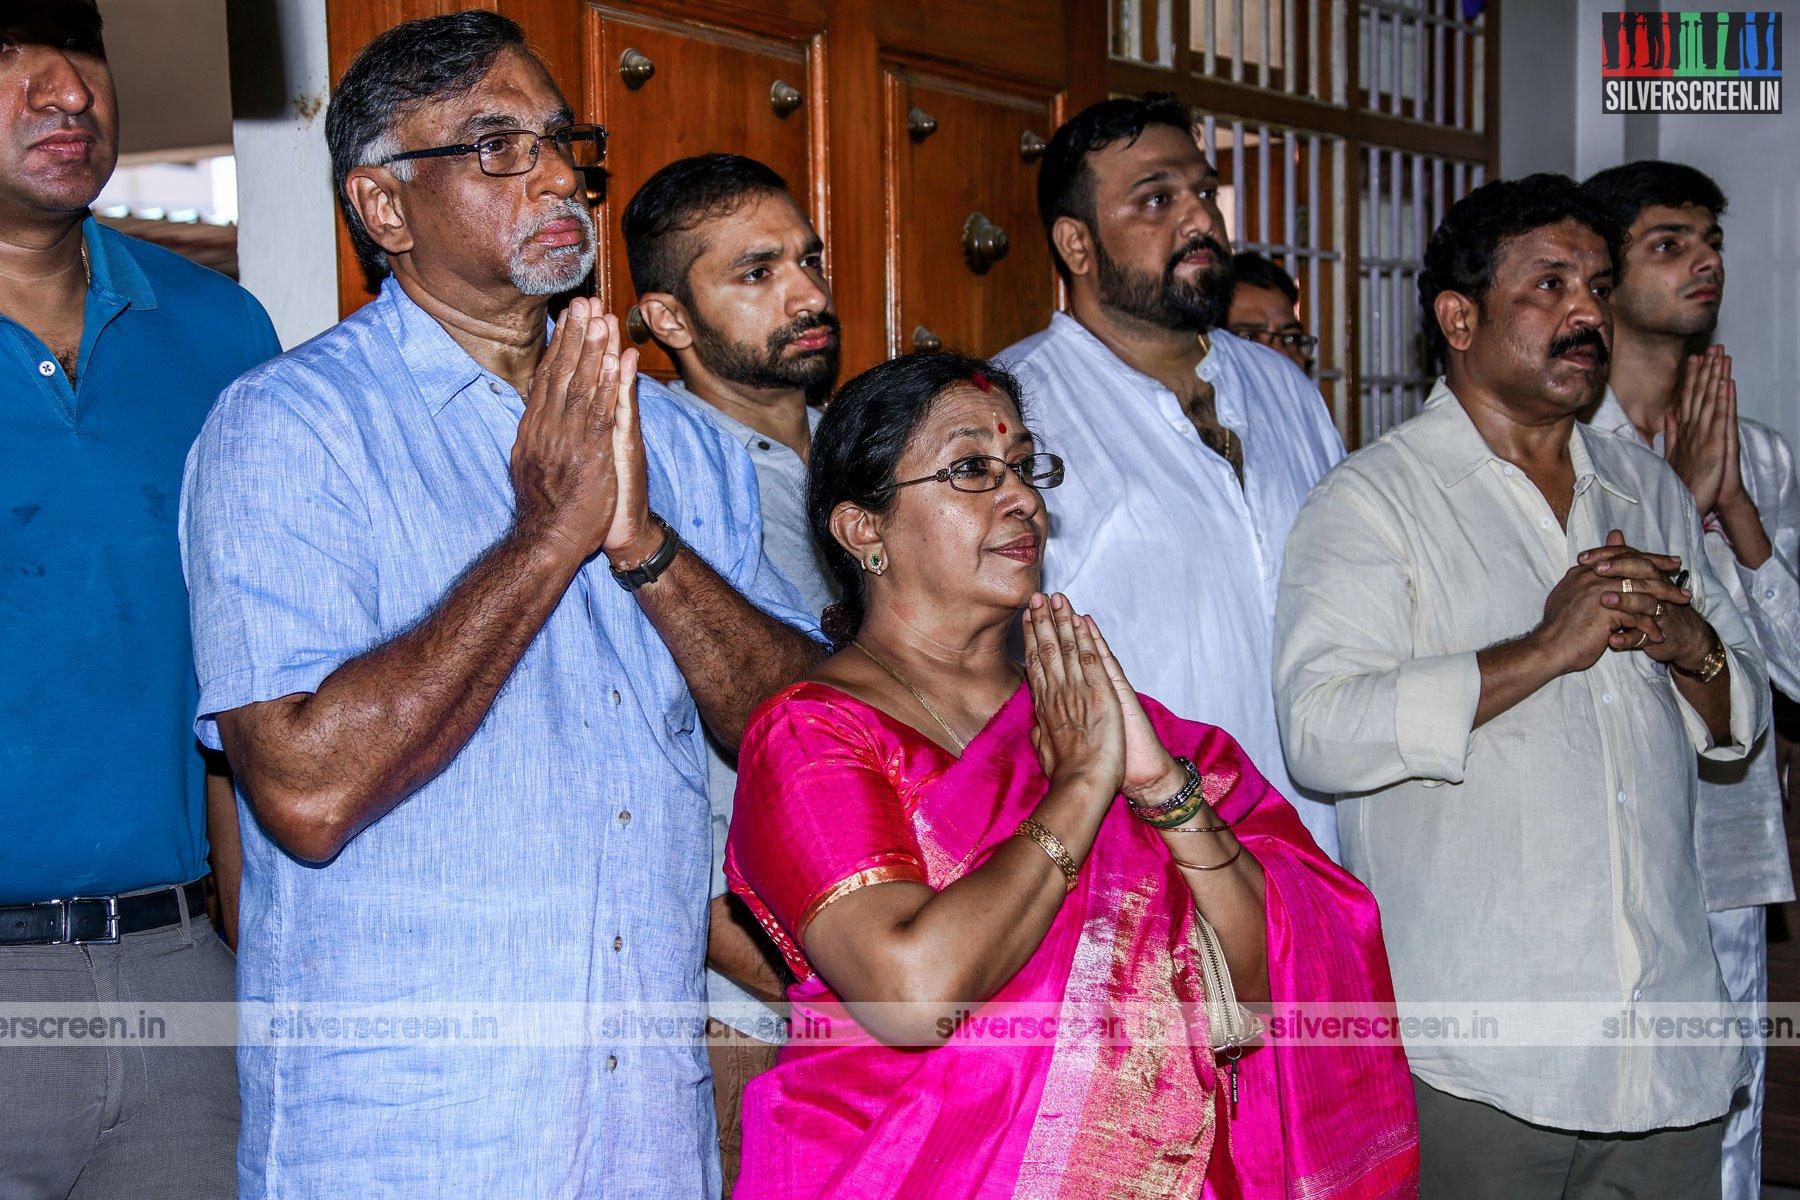 Ajith Kumar 57 Movie Launch Photos Silverscreenin